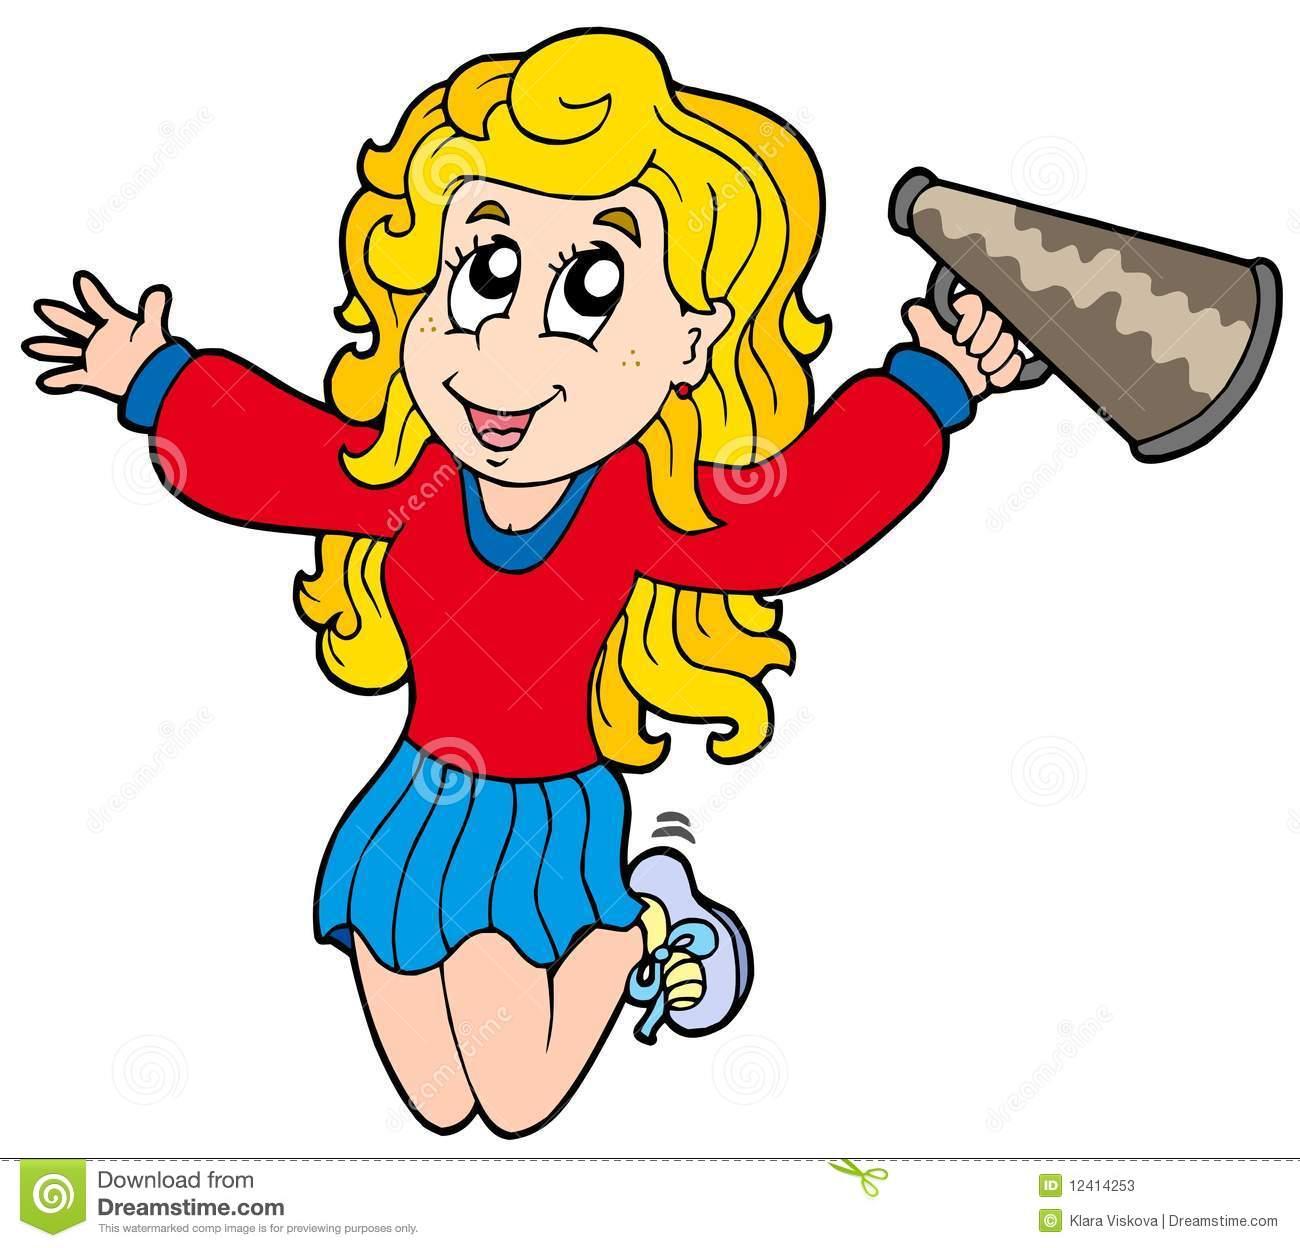 Cheerleader cartoon clipart 1 » Clipart Station.